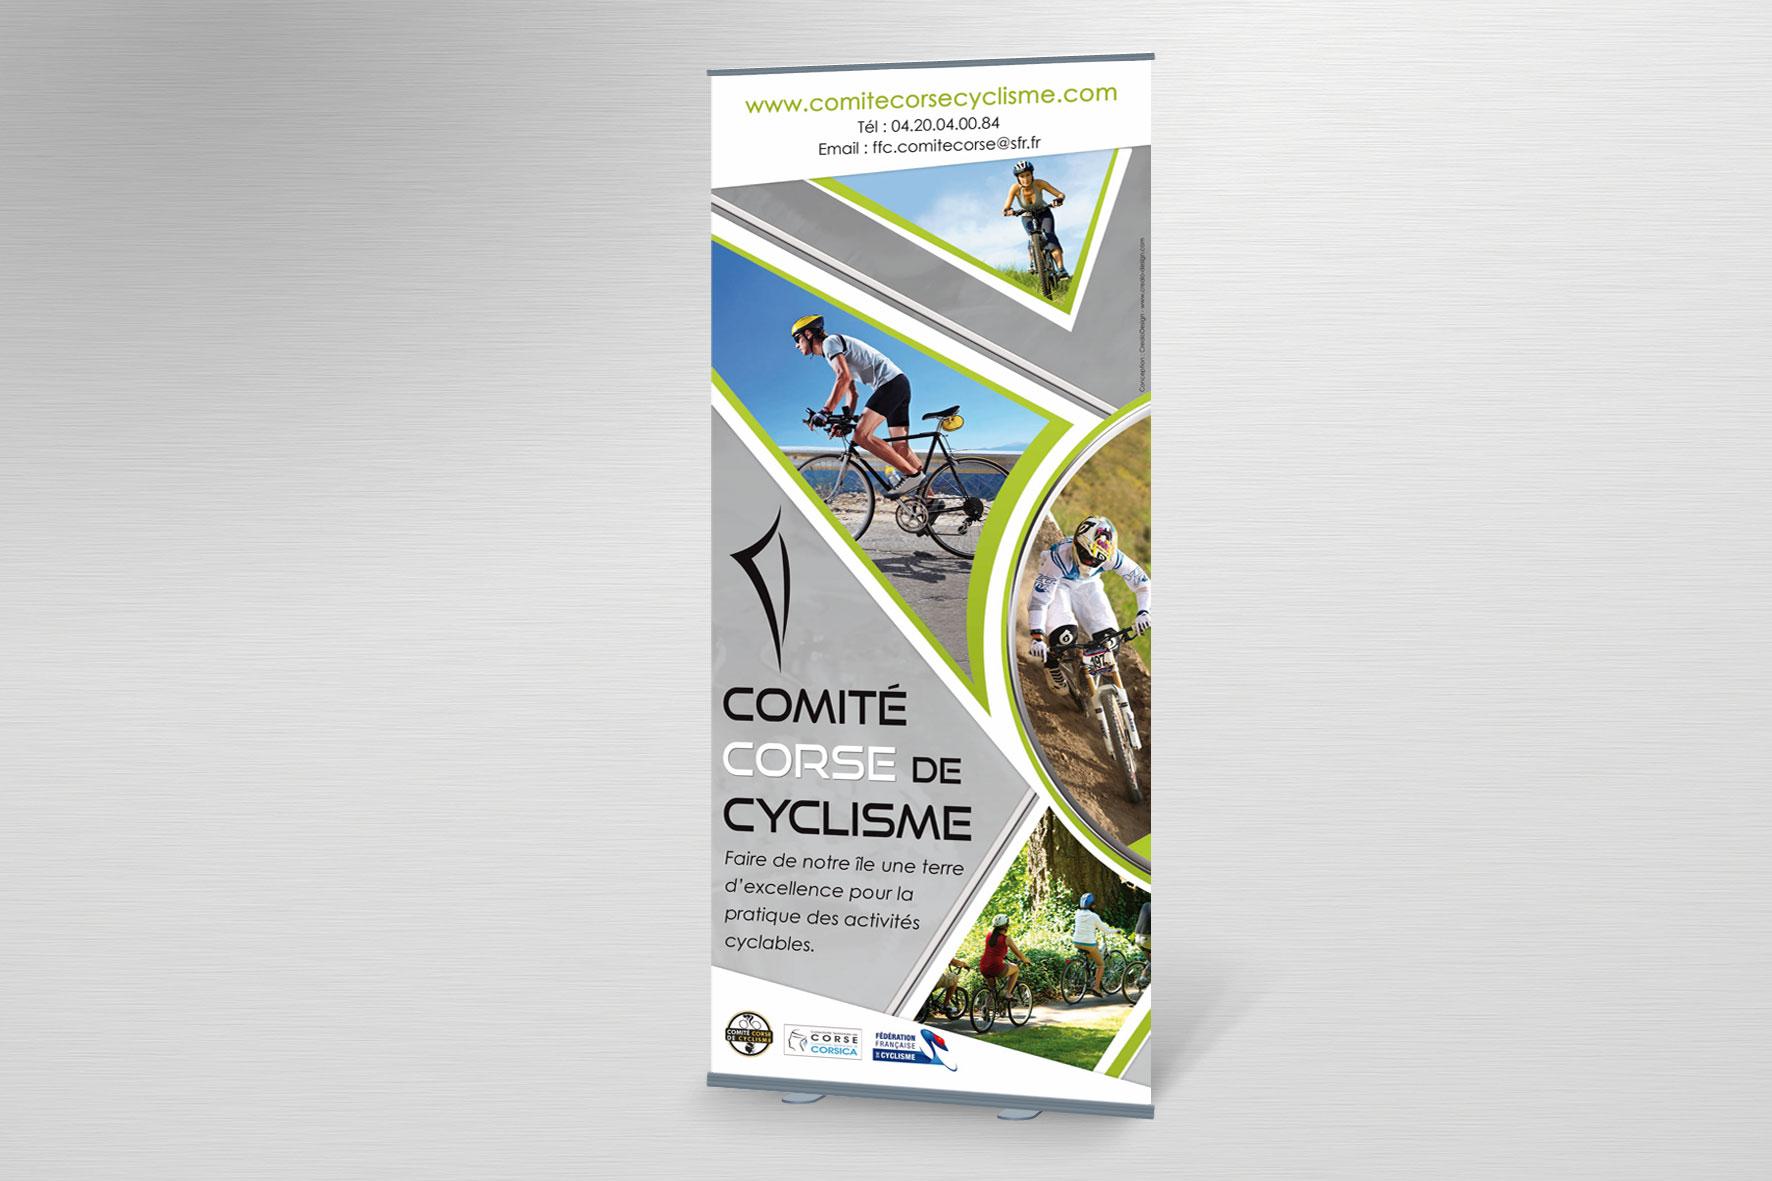 Comité Corse de Cyclisme